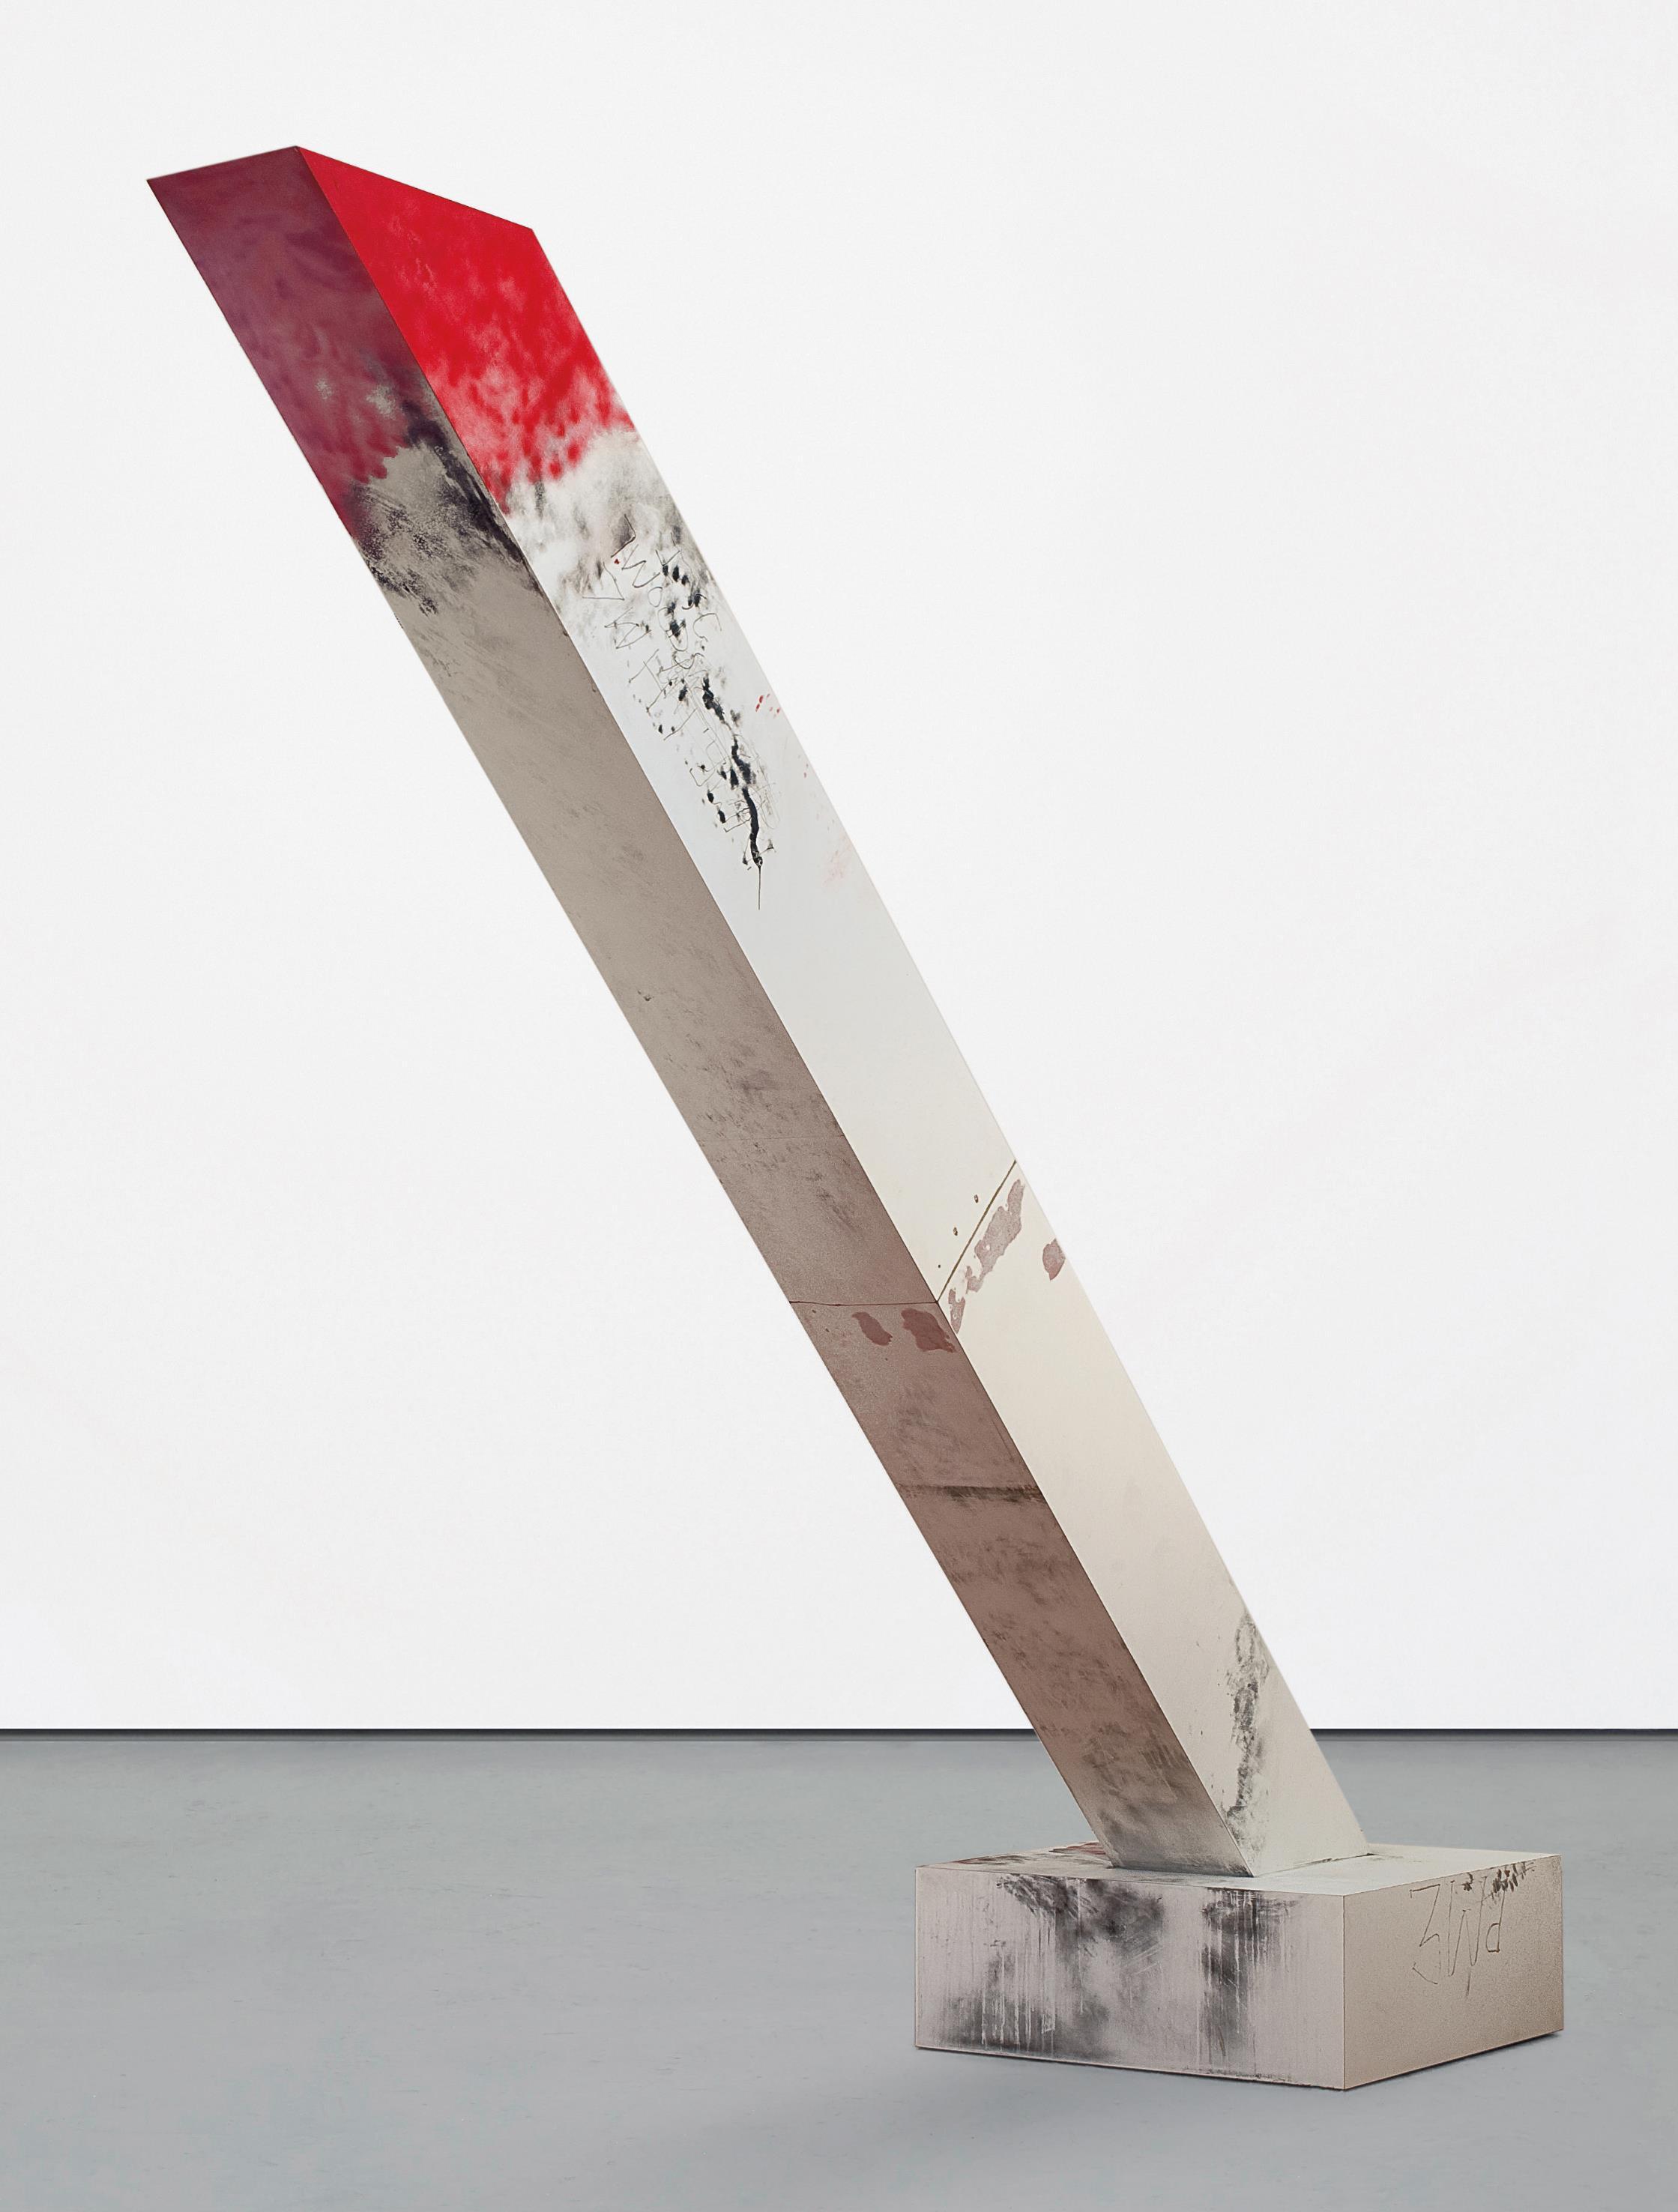 Sterling Ruby-Headless Dick/Deth Till-2008